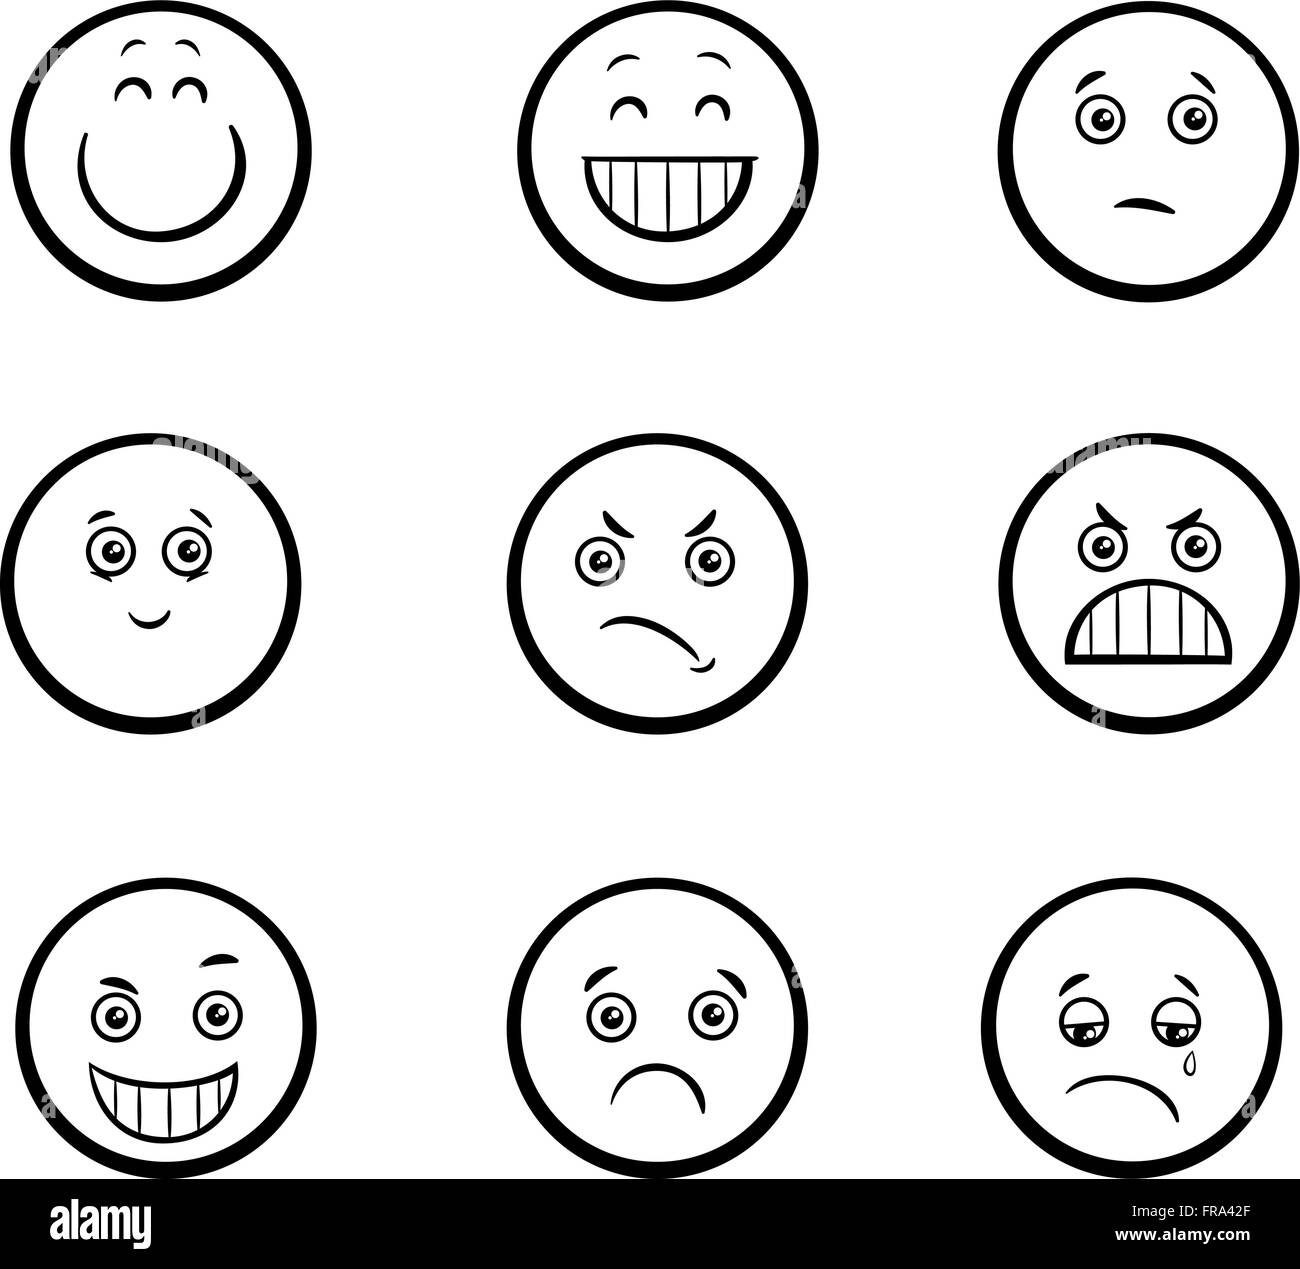 Black White Cartoon Illustration Emoticon Imágenes De Stock Black